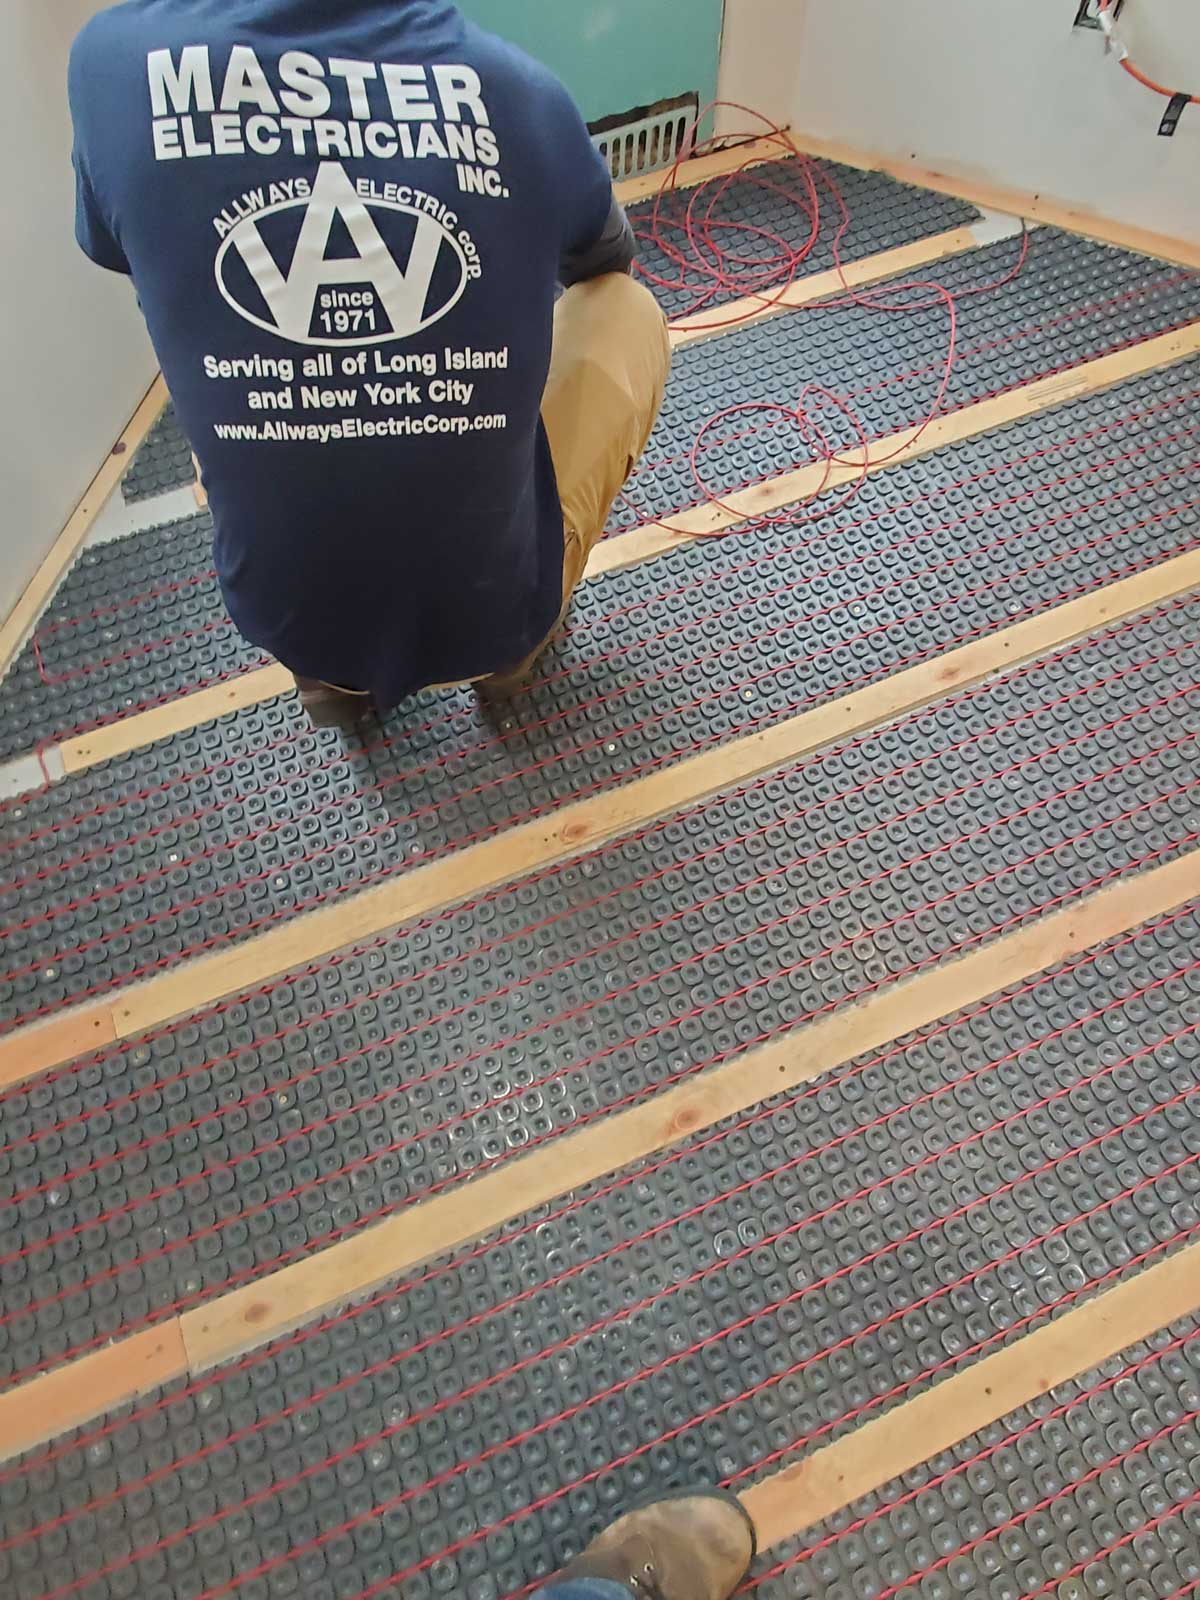 Electric Heat Mat Installation under floor in Bathroom in Westhampton NY